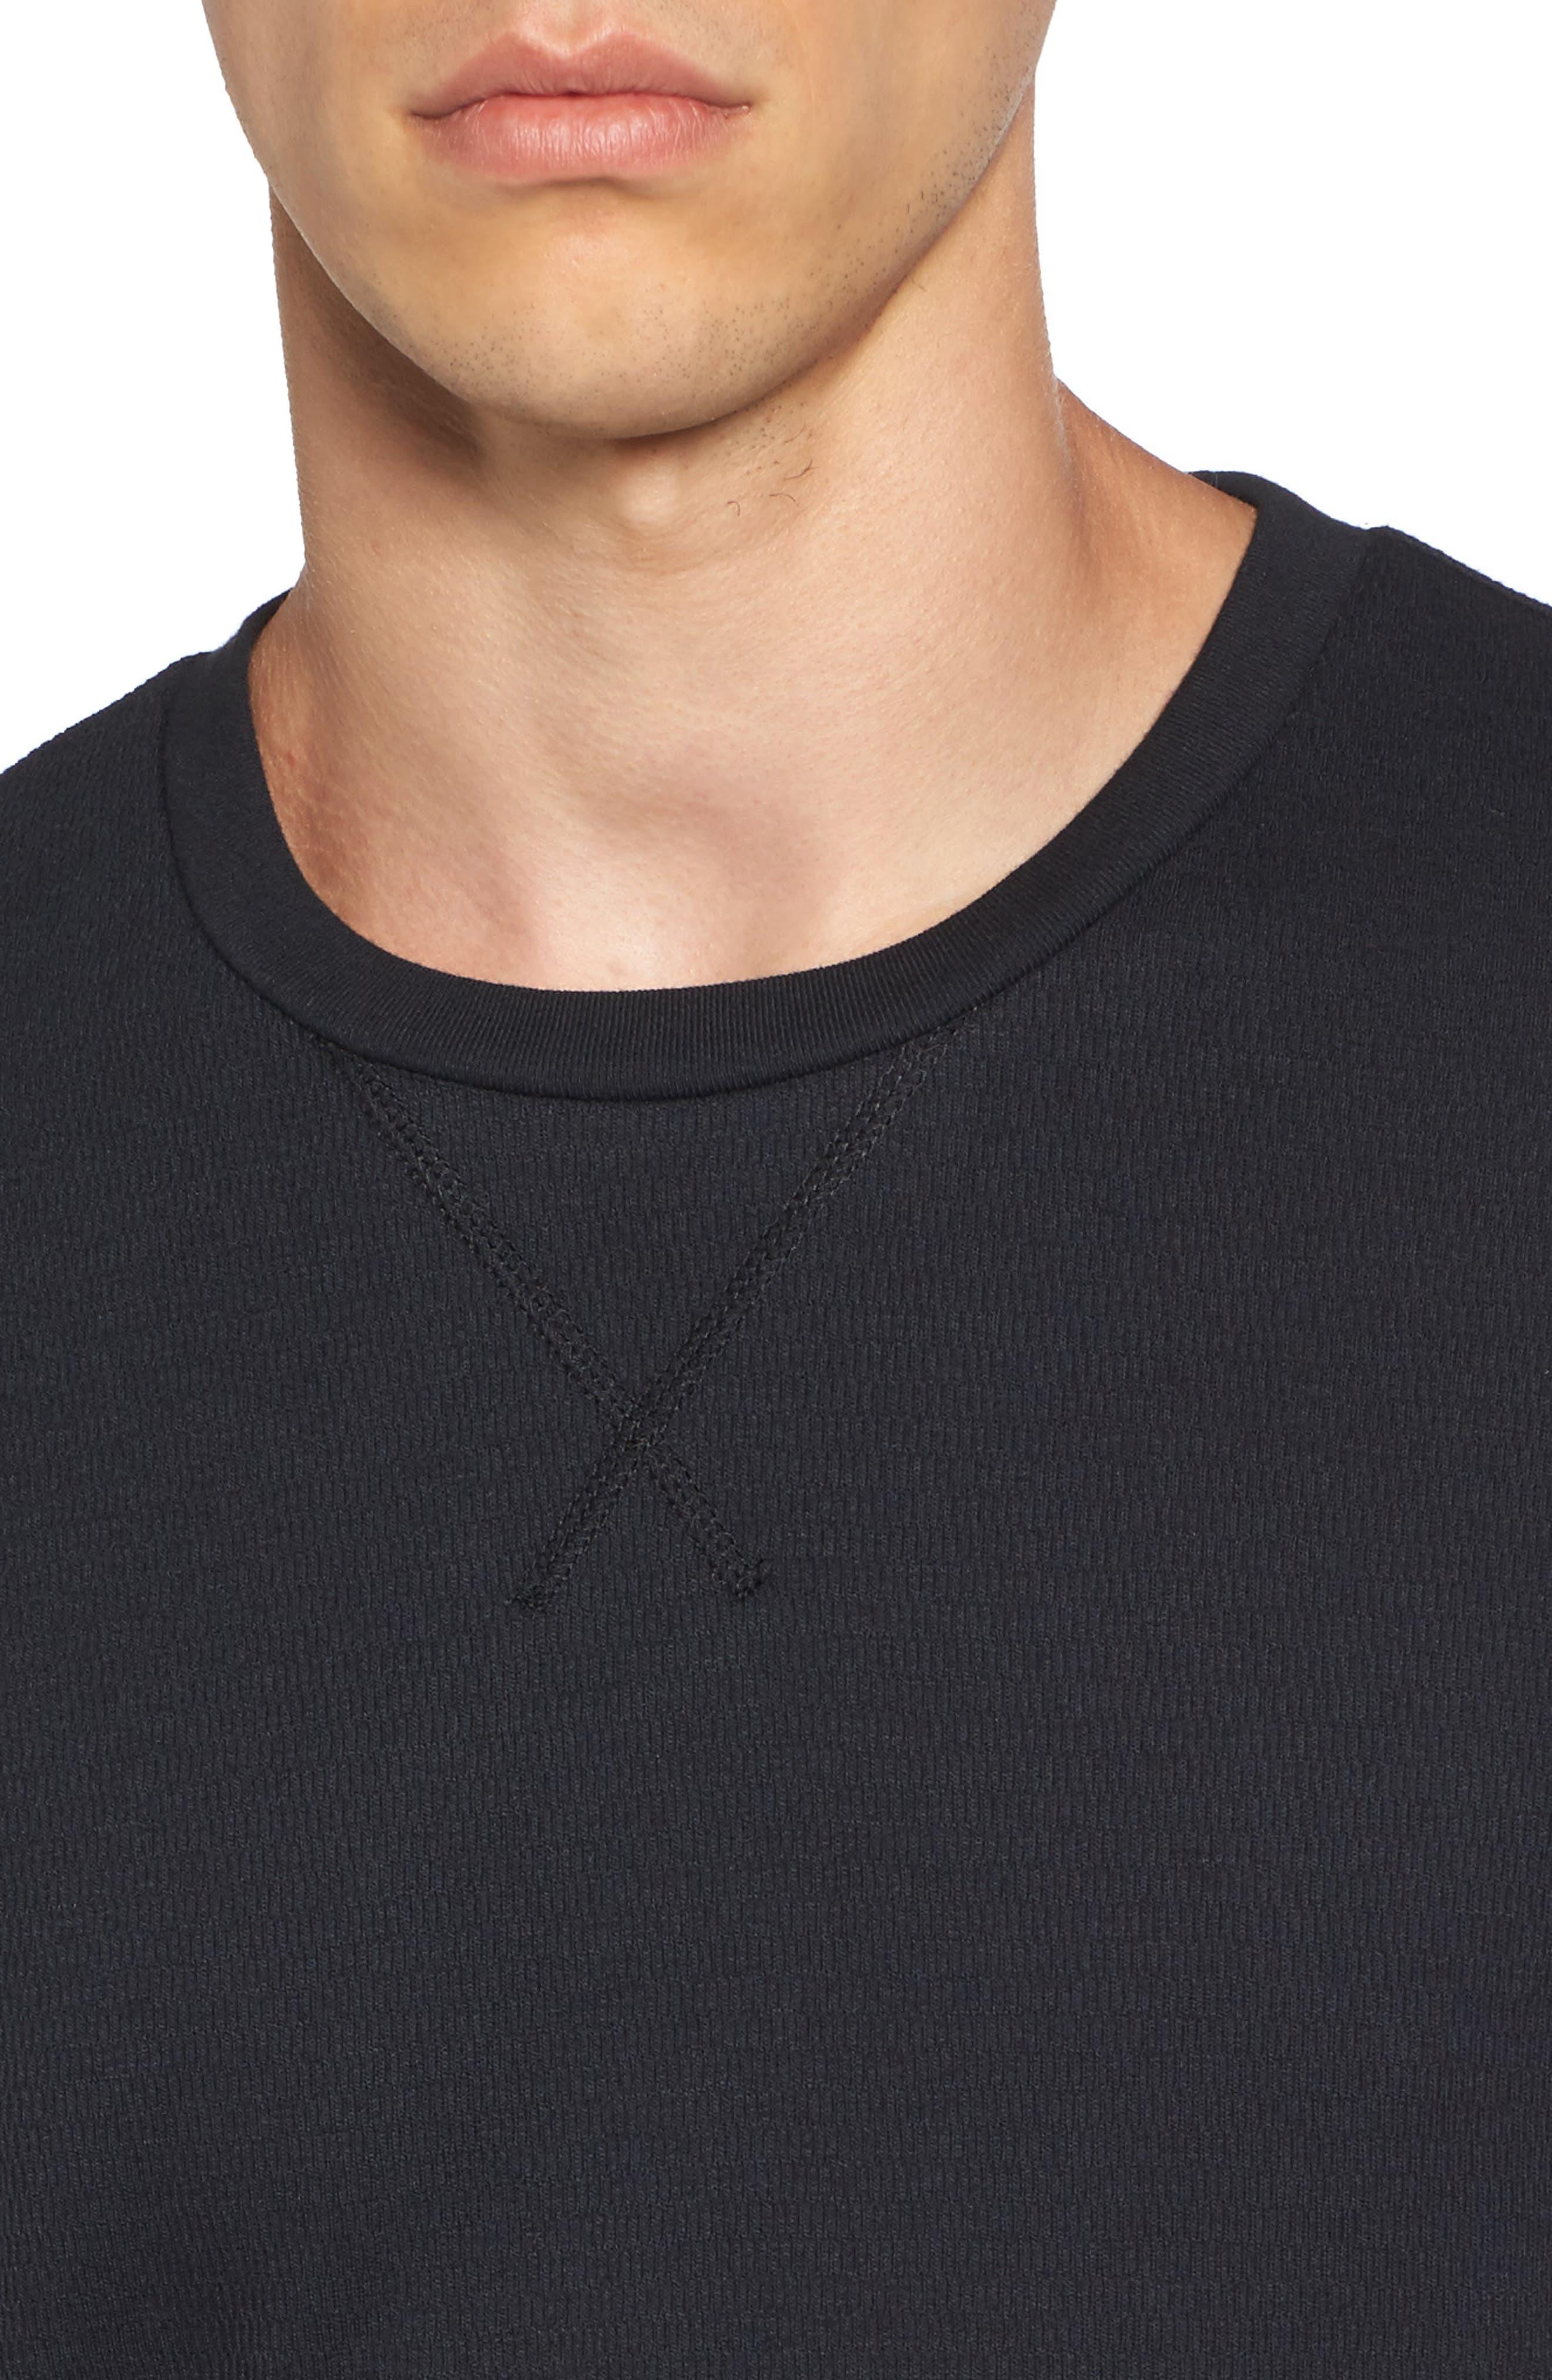 Longline Thermal T-Shirt,                             Alternate thumbnail 10, color,